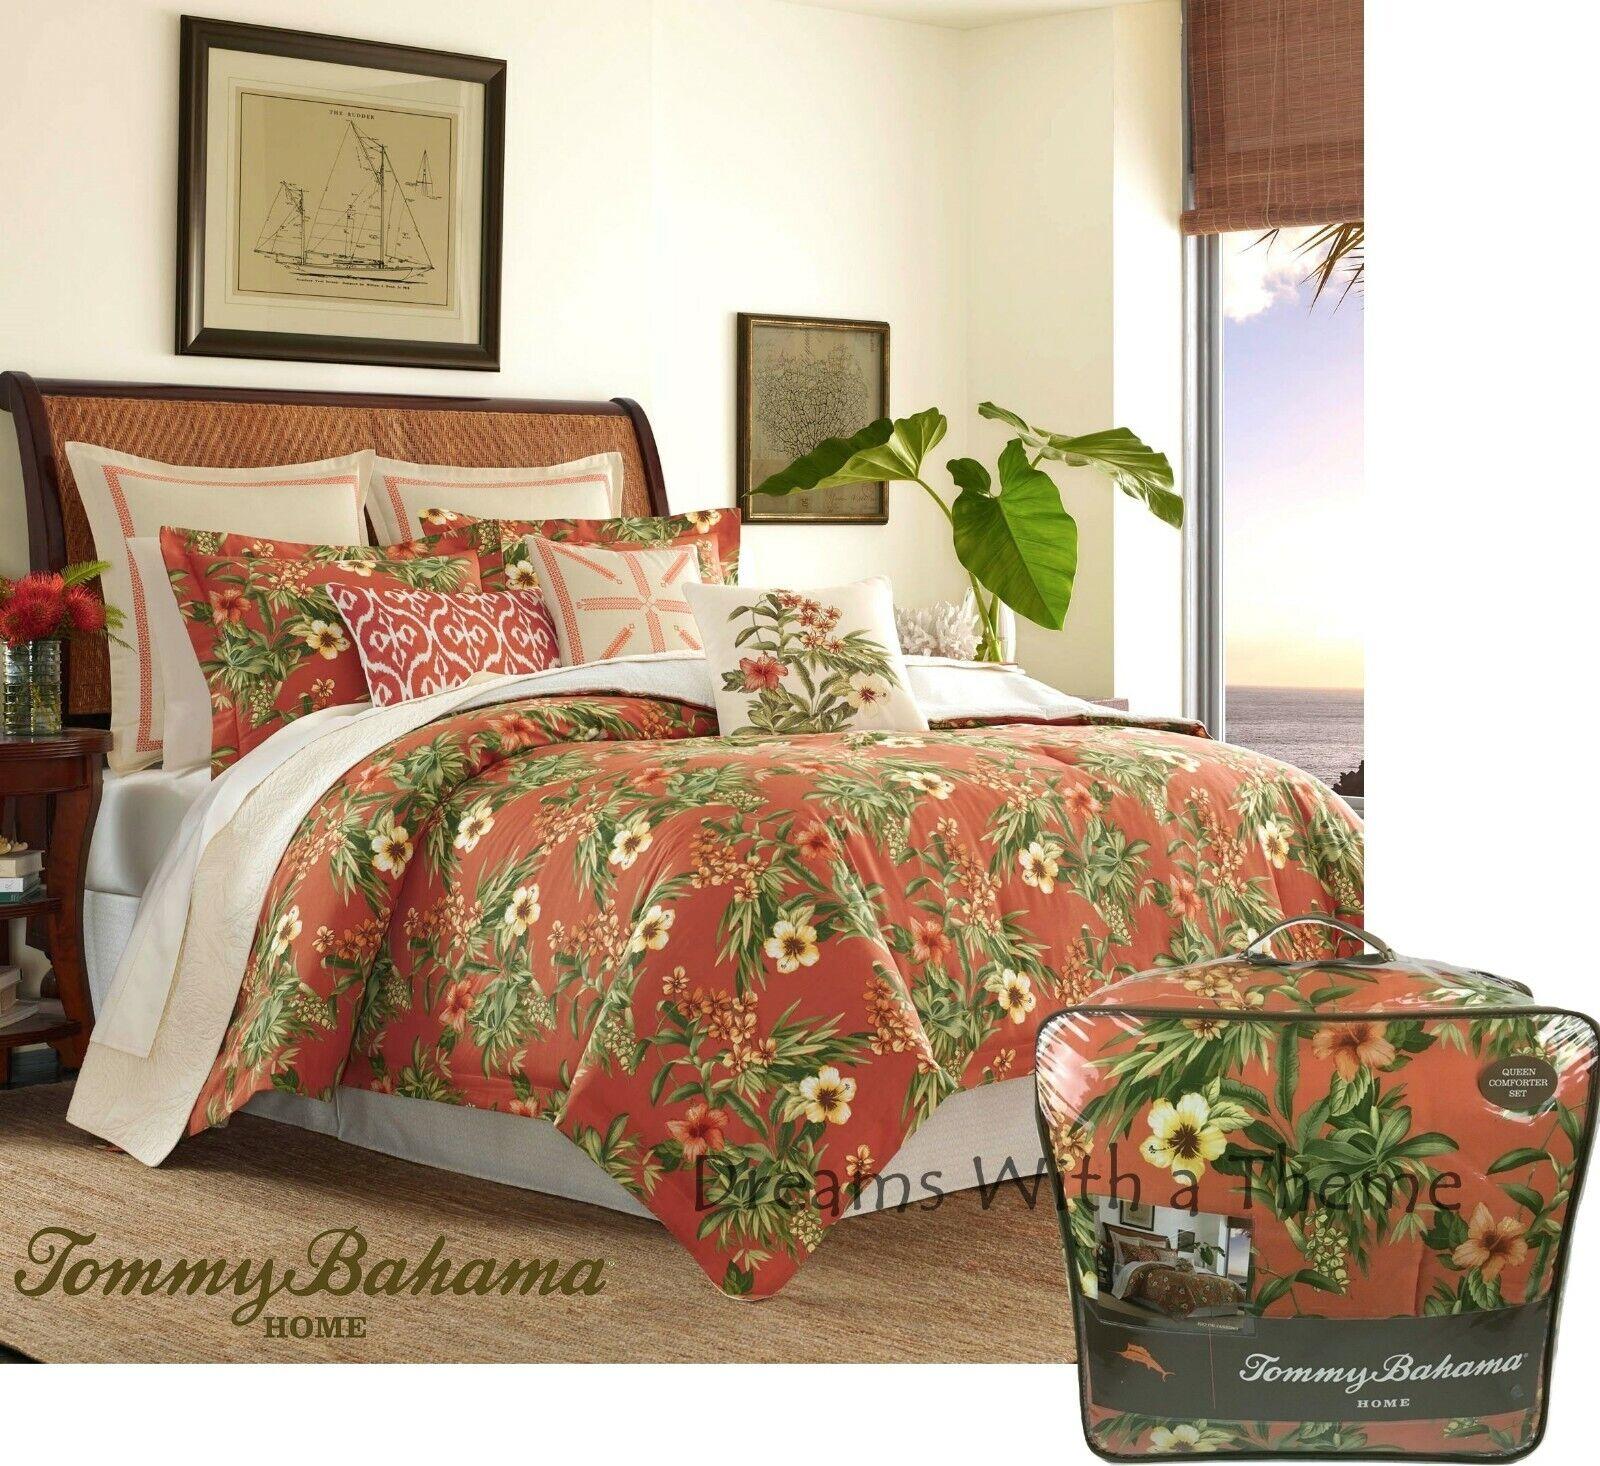 details about tommy bahama coral coastal rio de janeiro tropical floral 4p queen comforter set